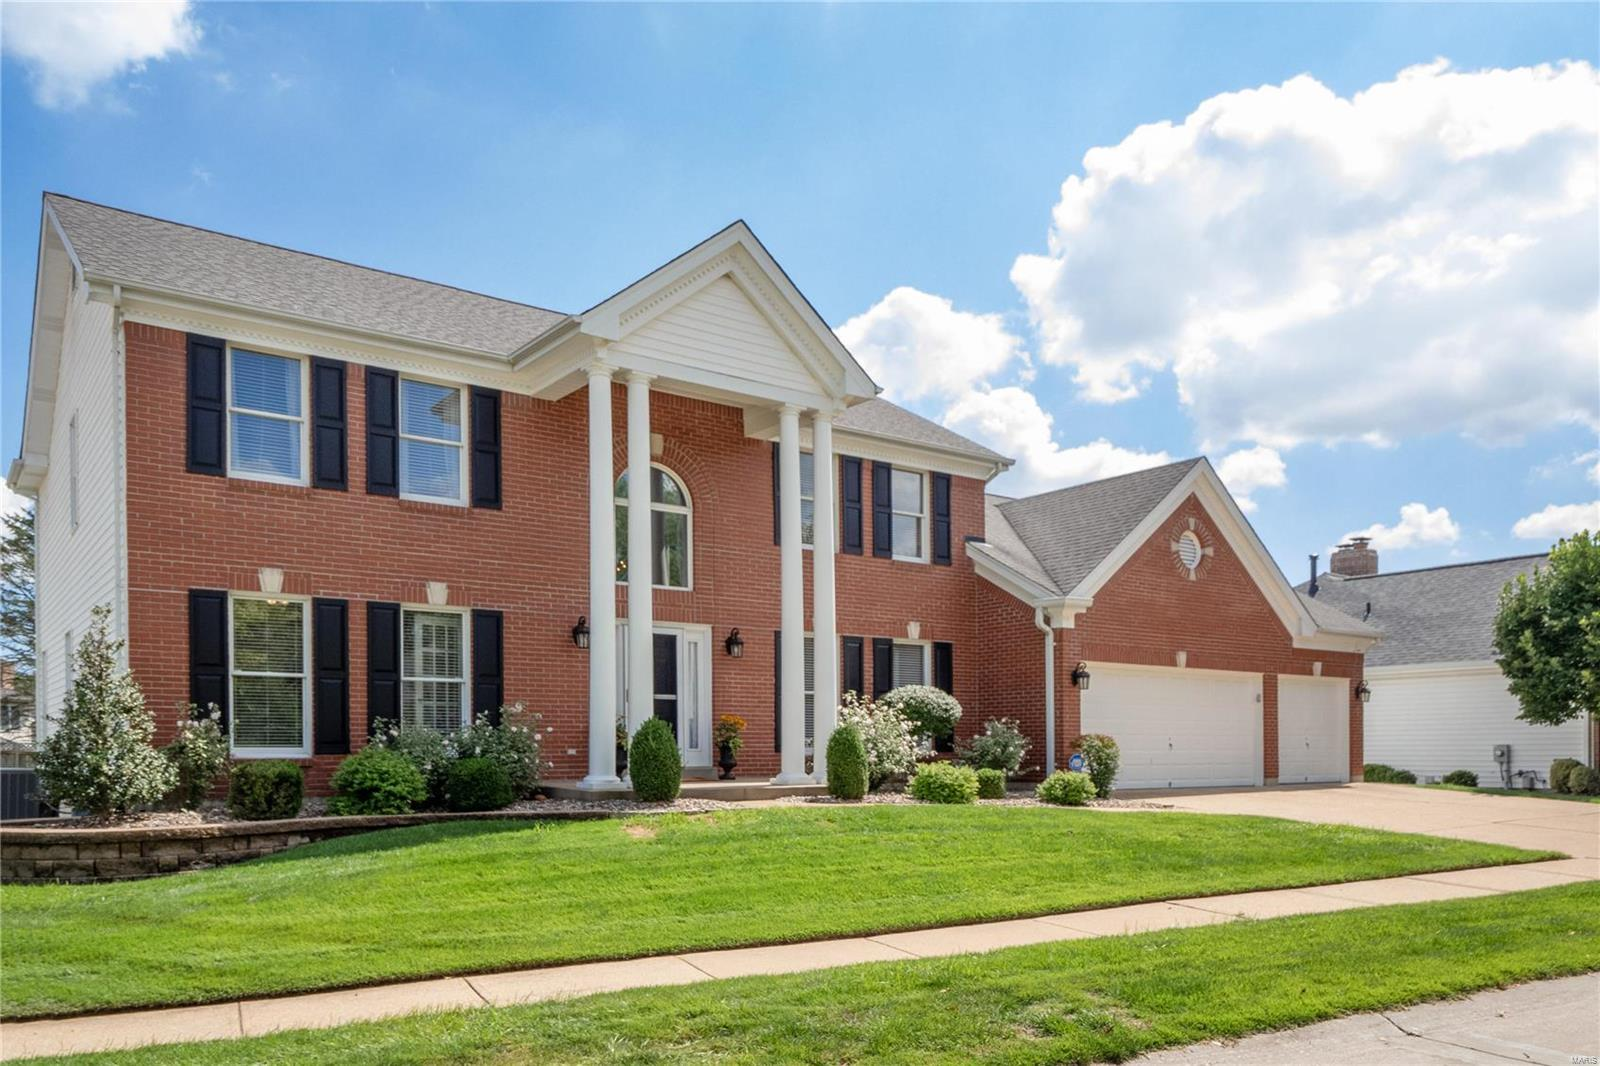 2224 Twin Estates Circle, Chesterfield, MO 63017